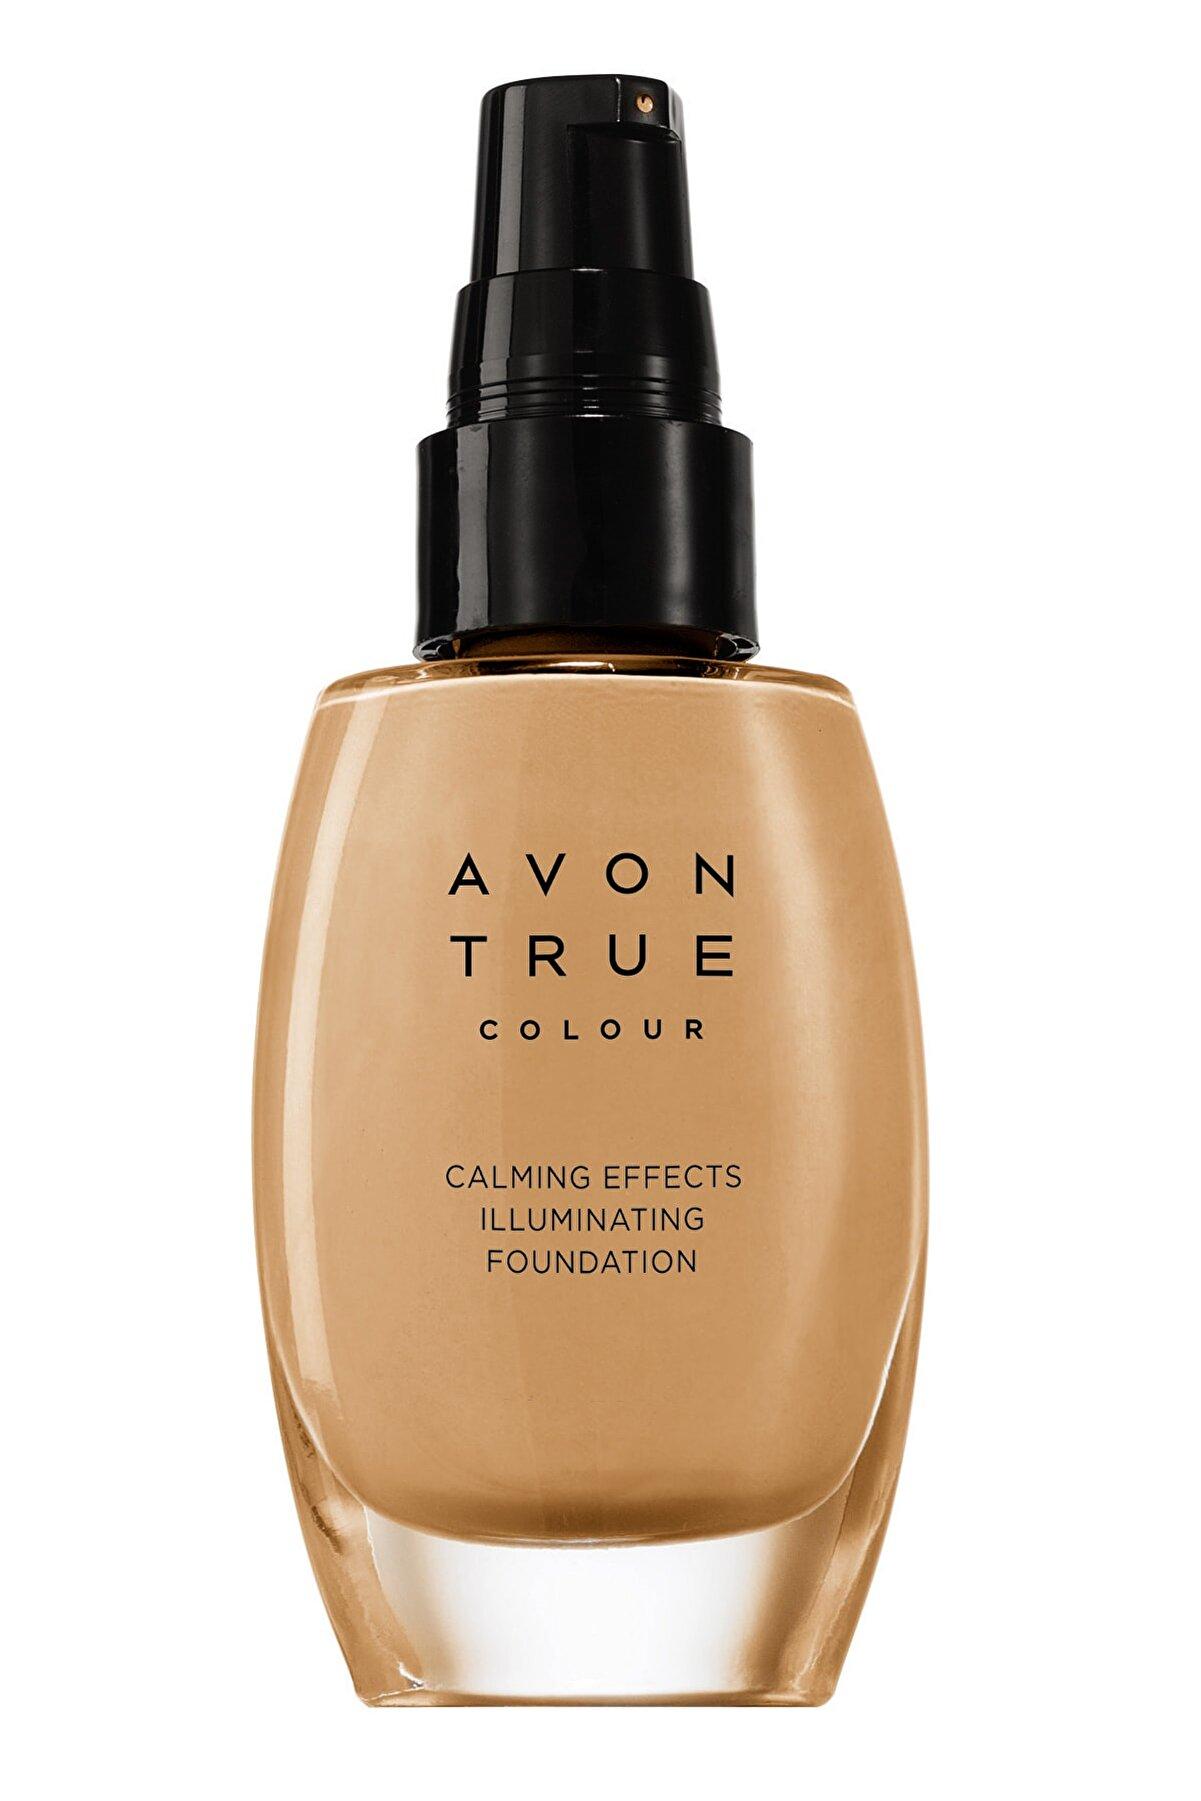 Avon Işıltı Veren Fondöten - Calming Effects Illuminating Foundation Cream 30 ml 8681298930297